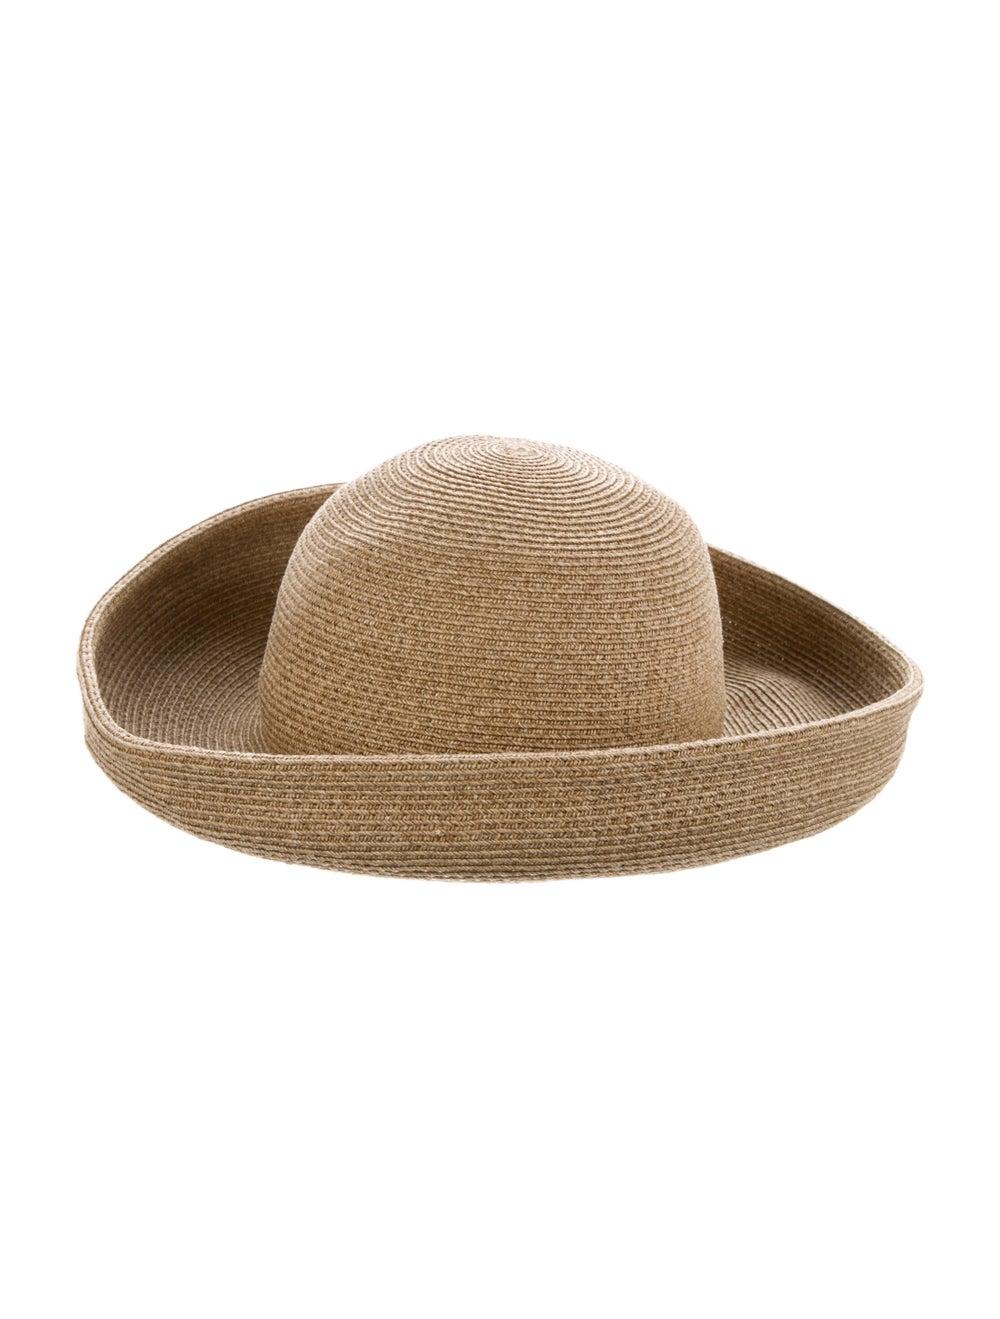 Eric Javits Straw Wide-Brim Hat - image 1